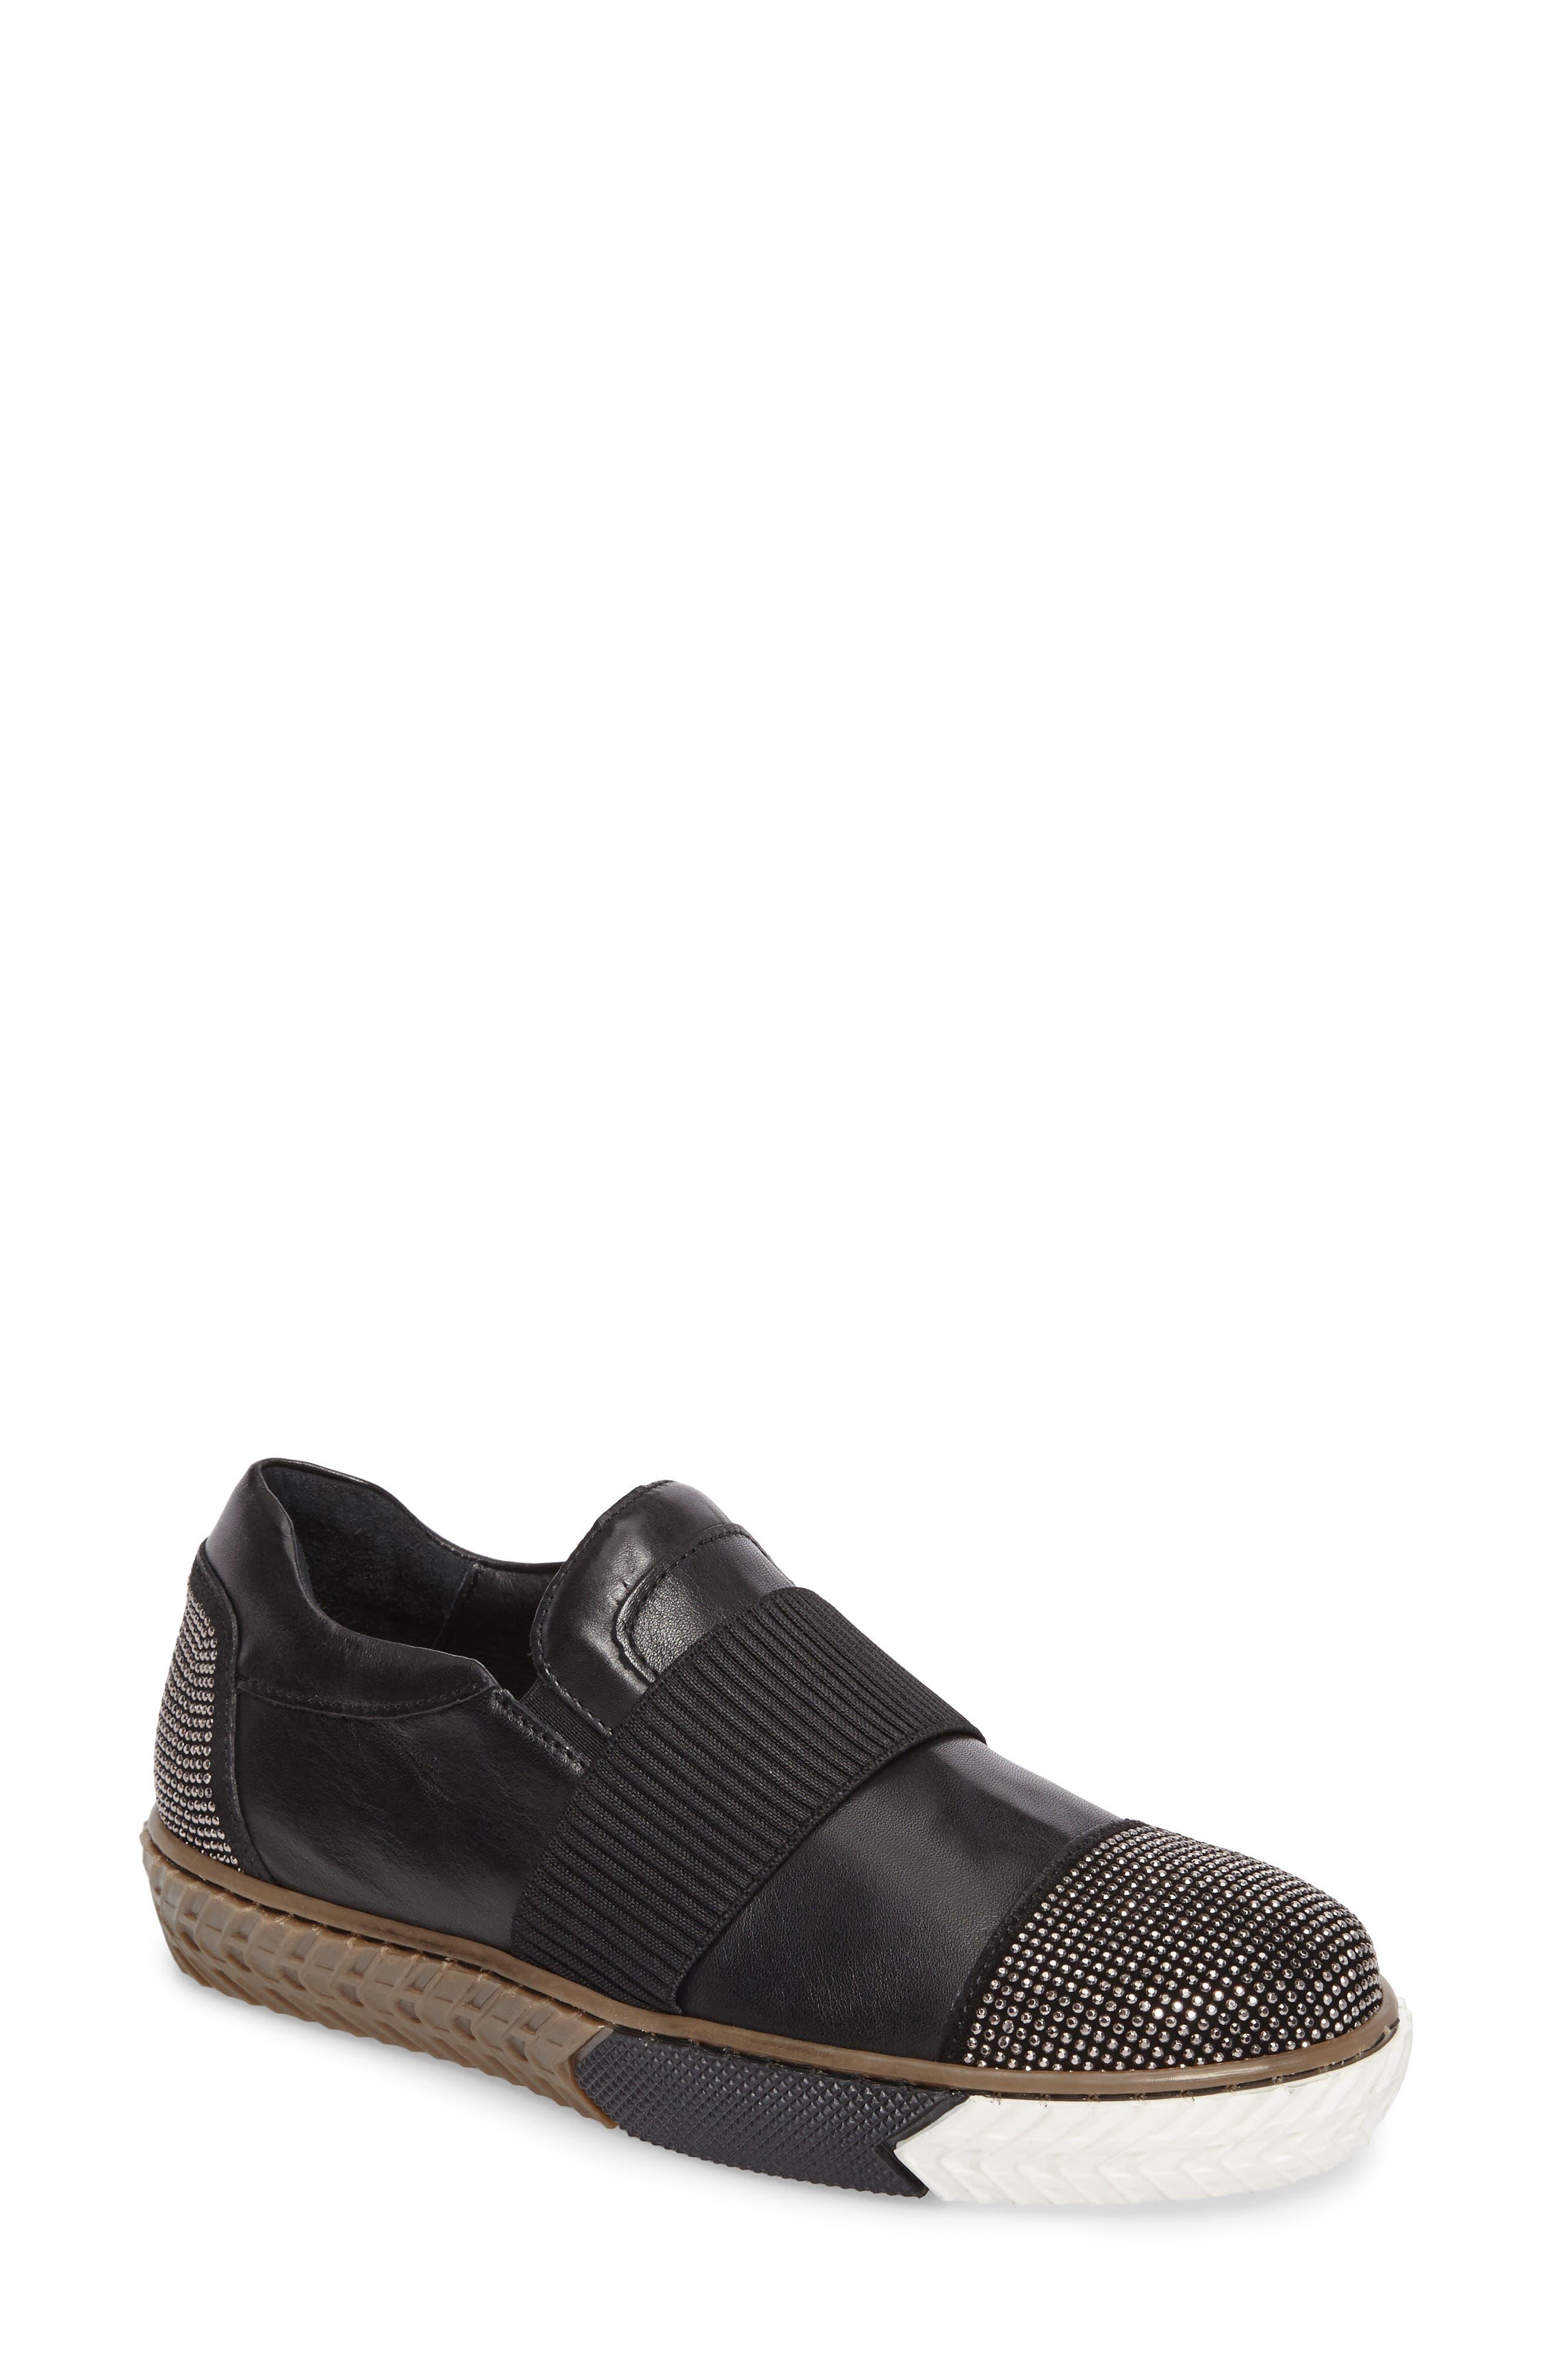 Vibe Slip-On Sneaker,                         Main,                         color, 001